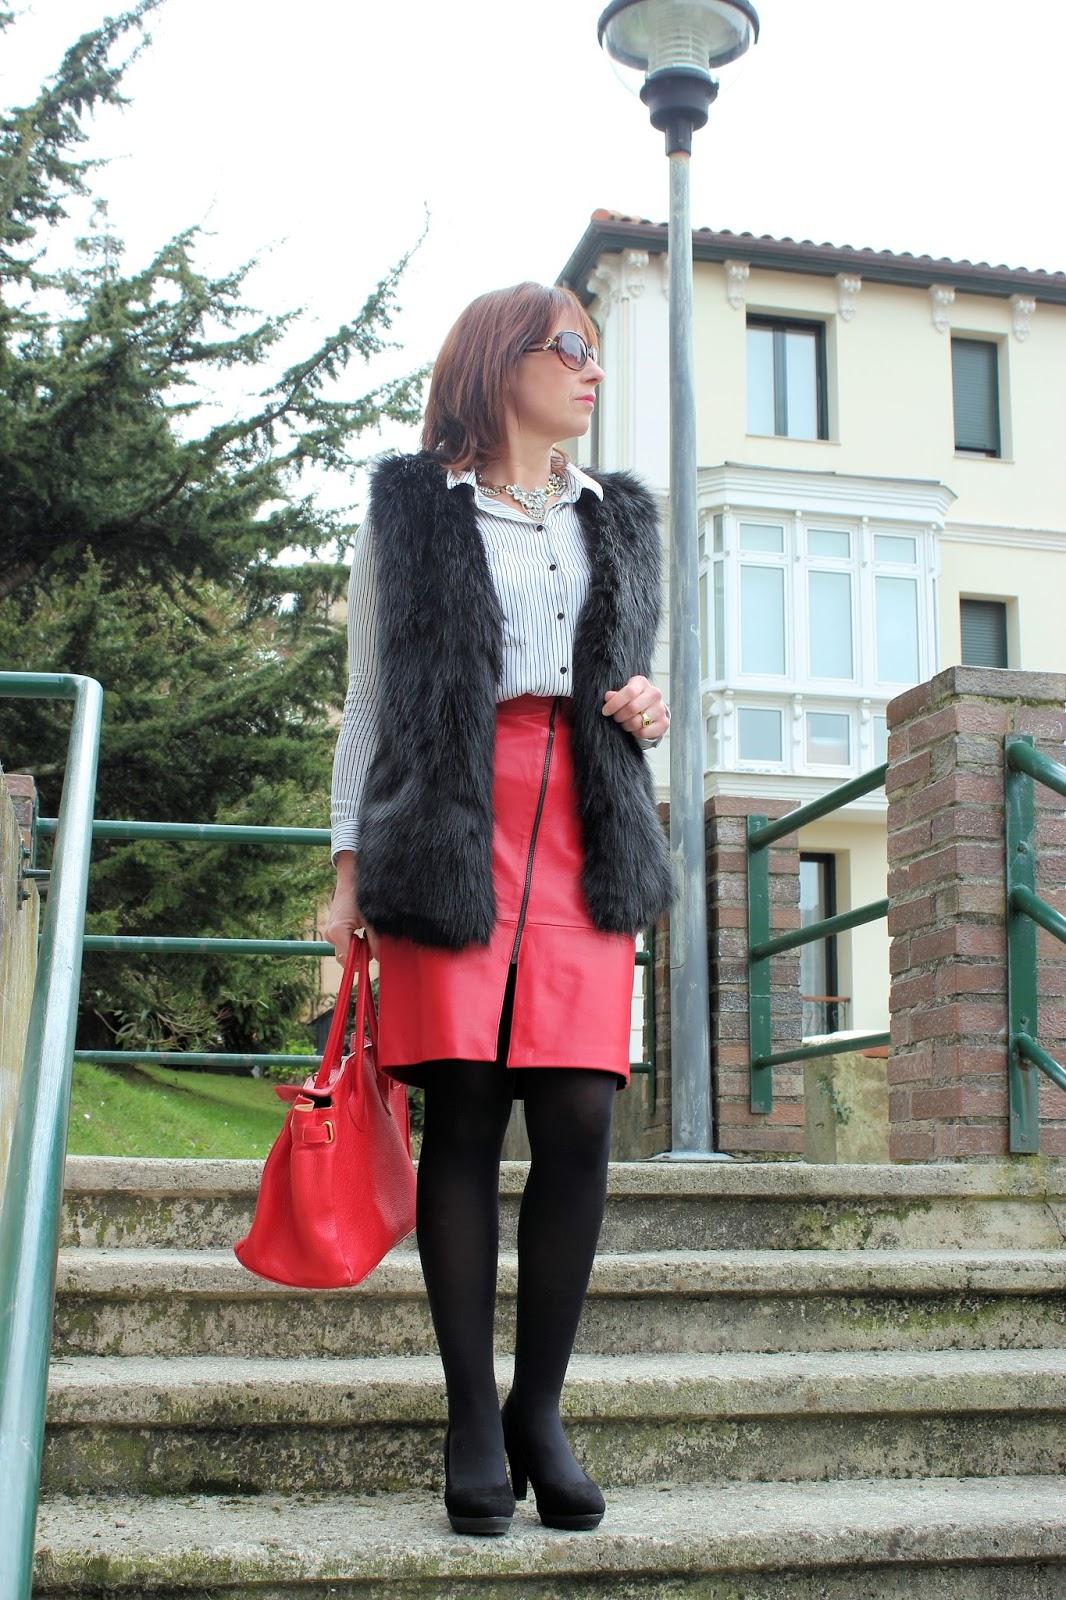 Br jula de estilo mis looks falda roja y chaleco de pelo - Brujula de estilo ...